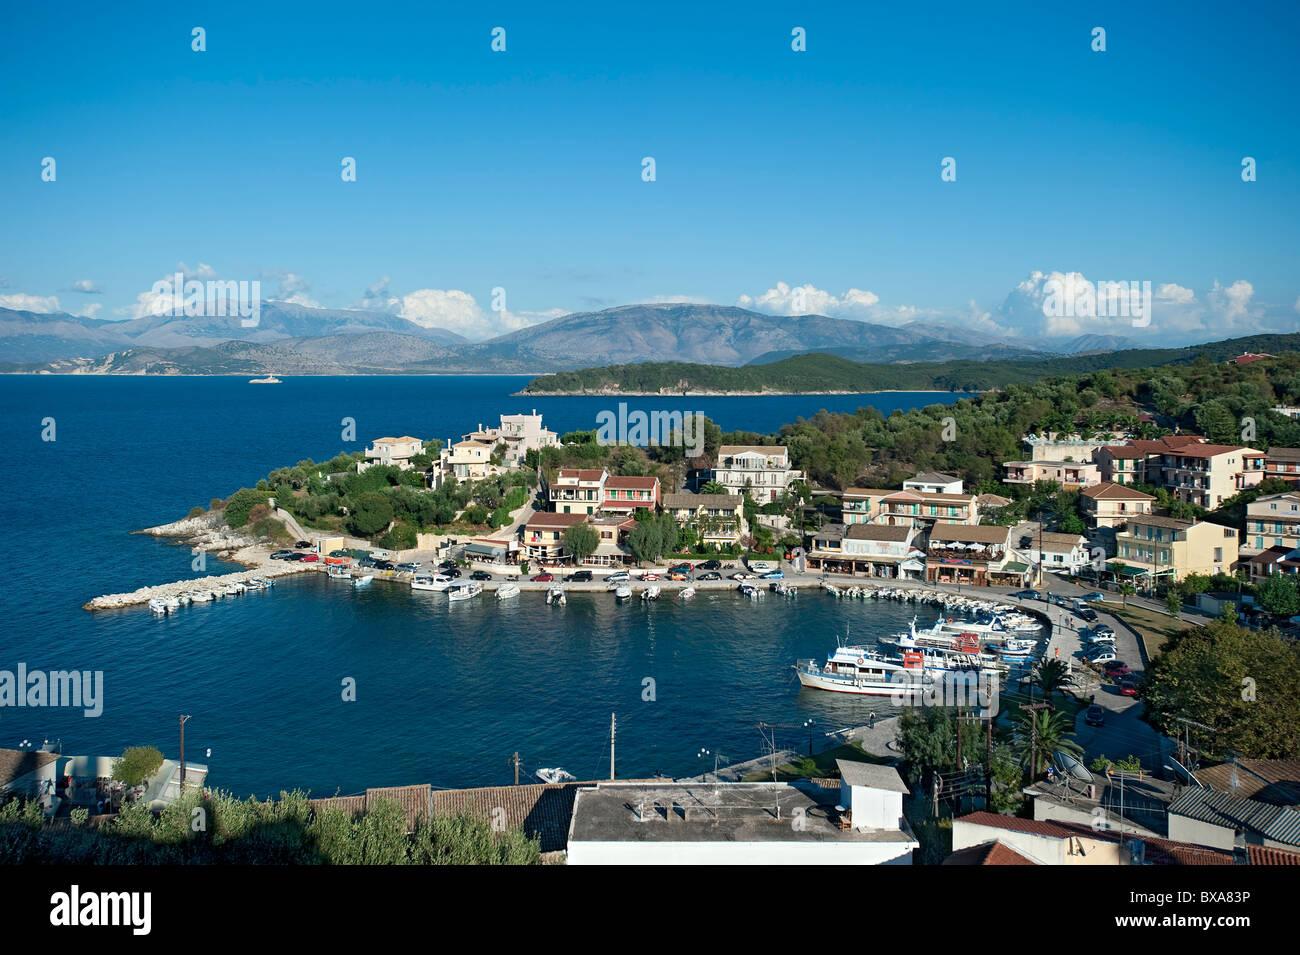 Kassiopi Harbour, Corfu, Greece - Stock Image